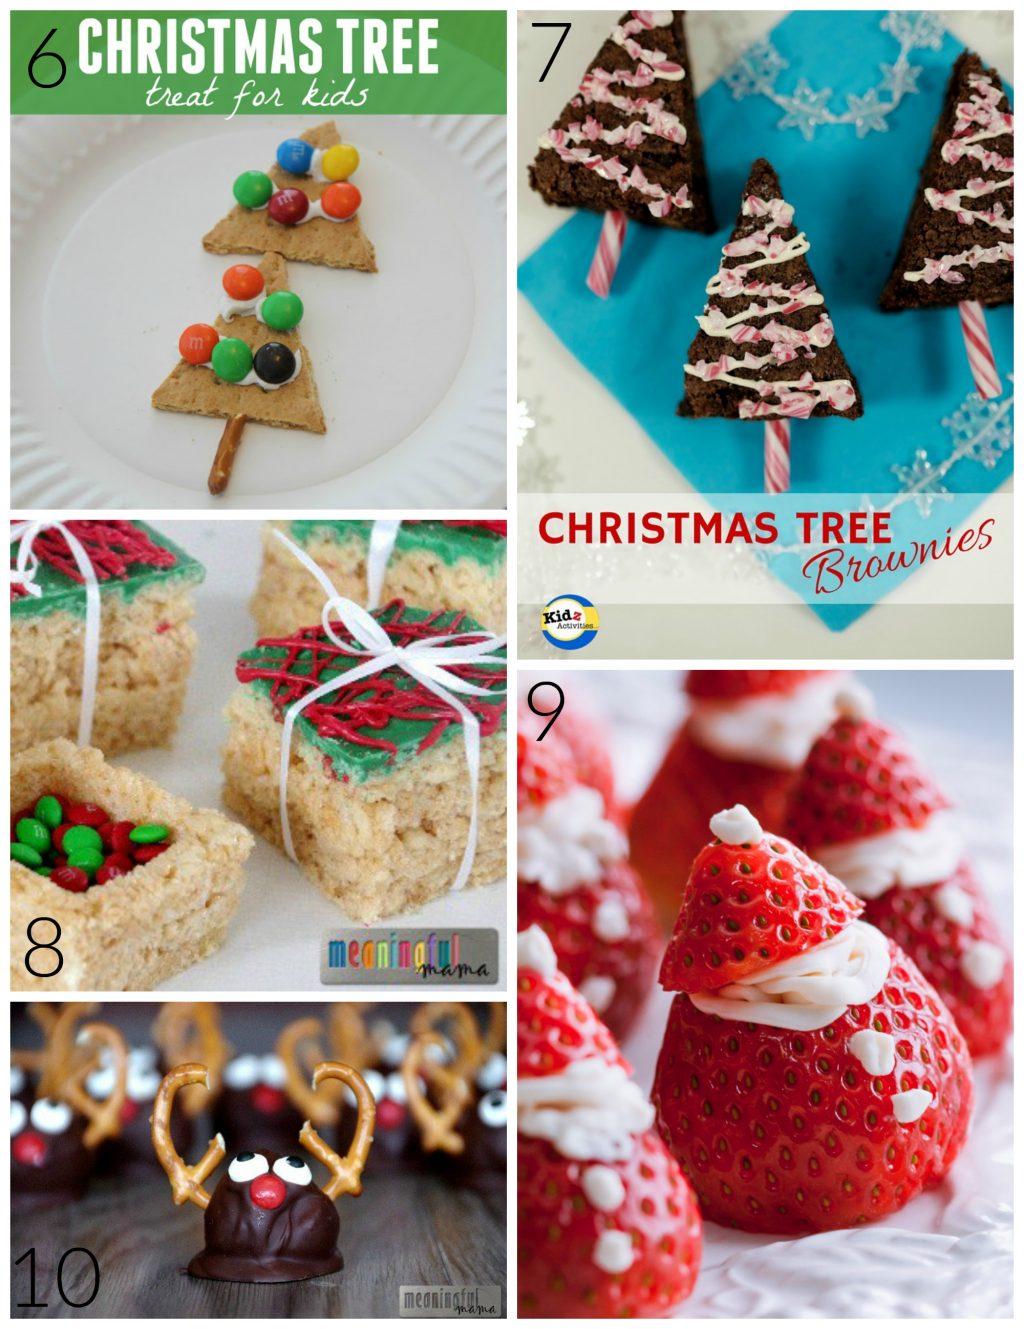 Top 10 Kid Made Treats for Christmas